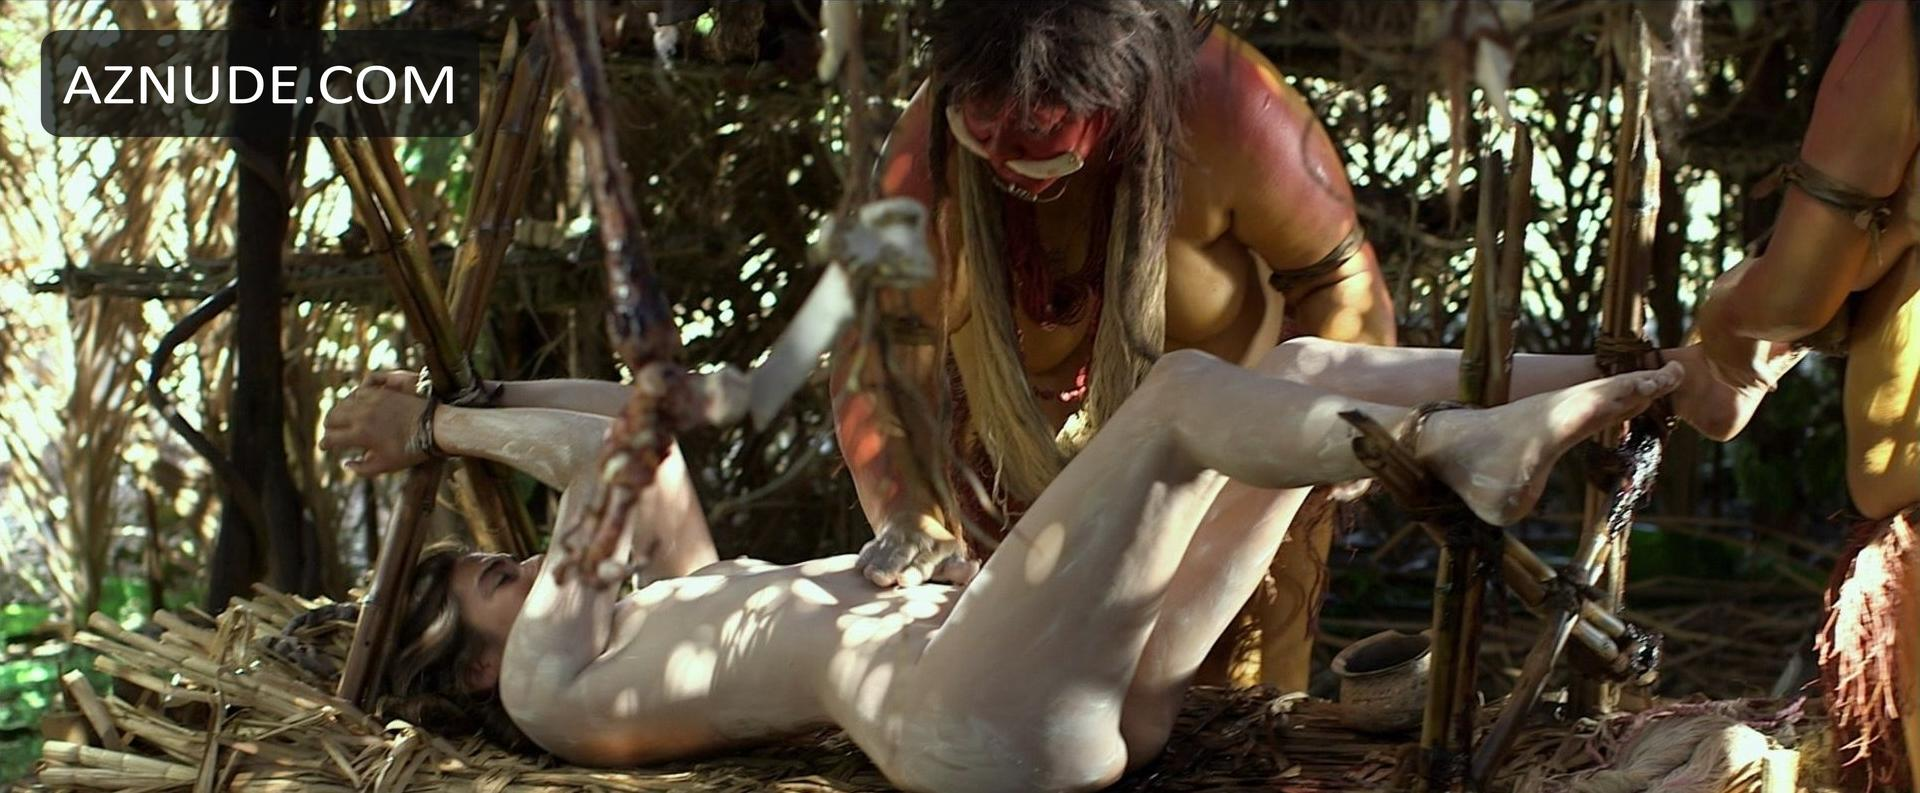 Lorenza izzo sex scene